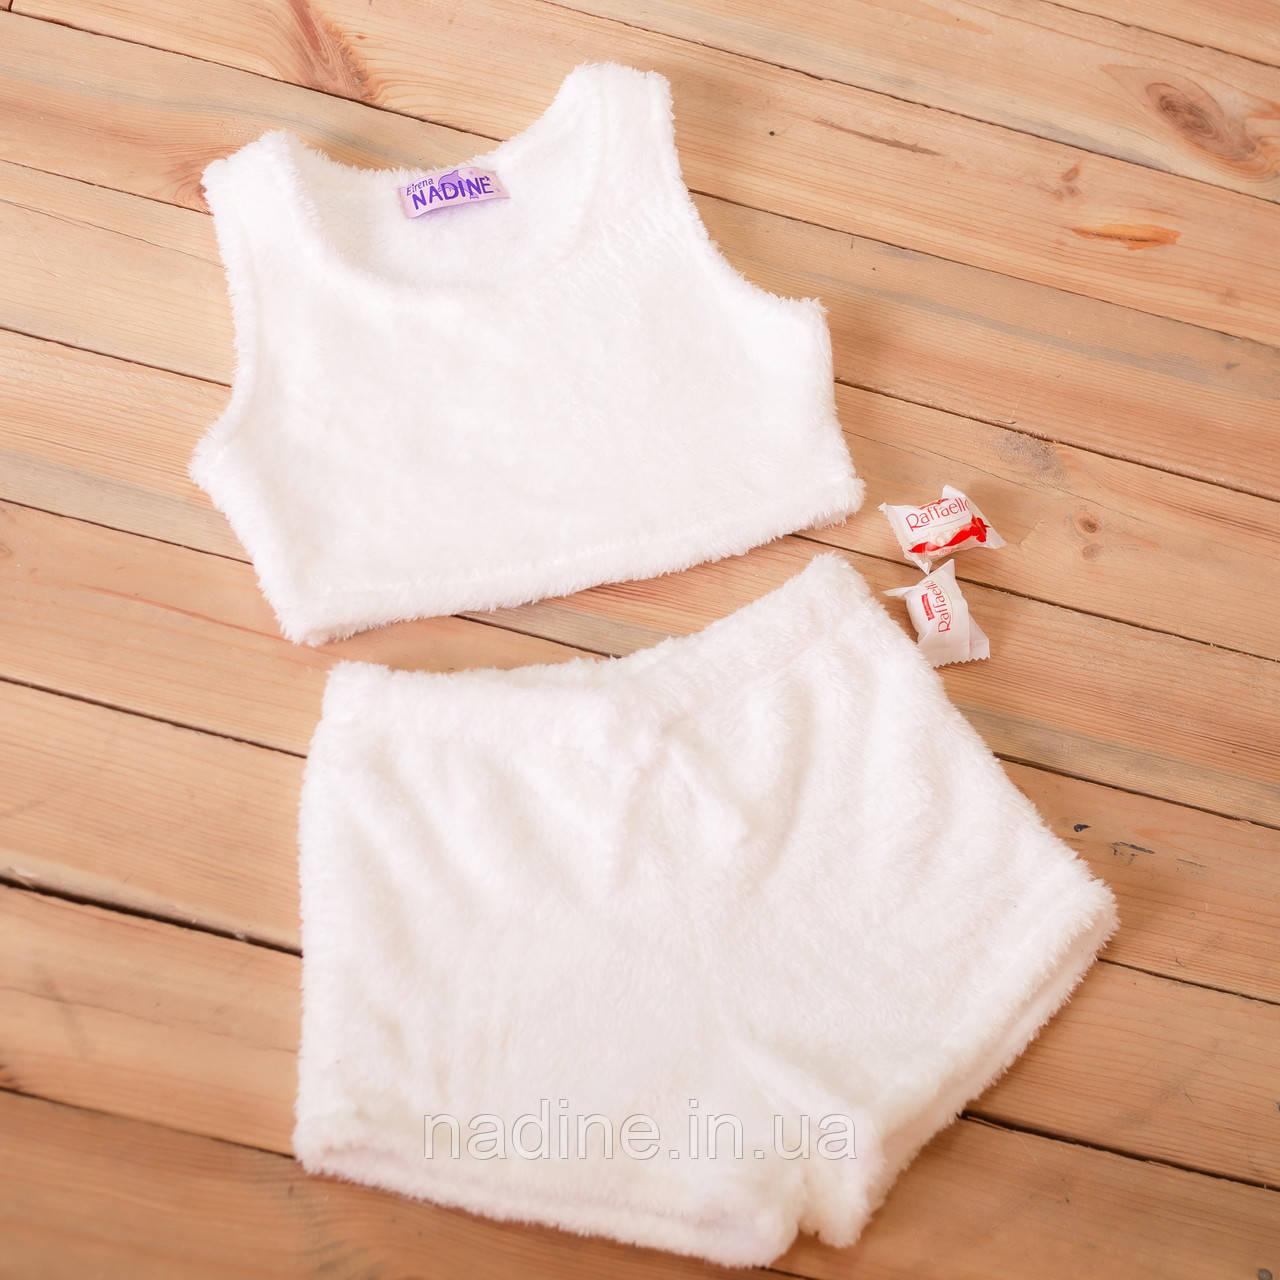 "Топ + шорти піжама ""White"" Eirena Nadine (773-58) біла на зріст 158"